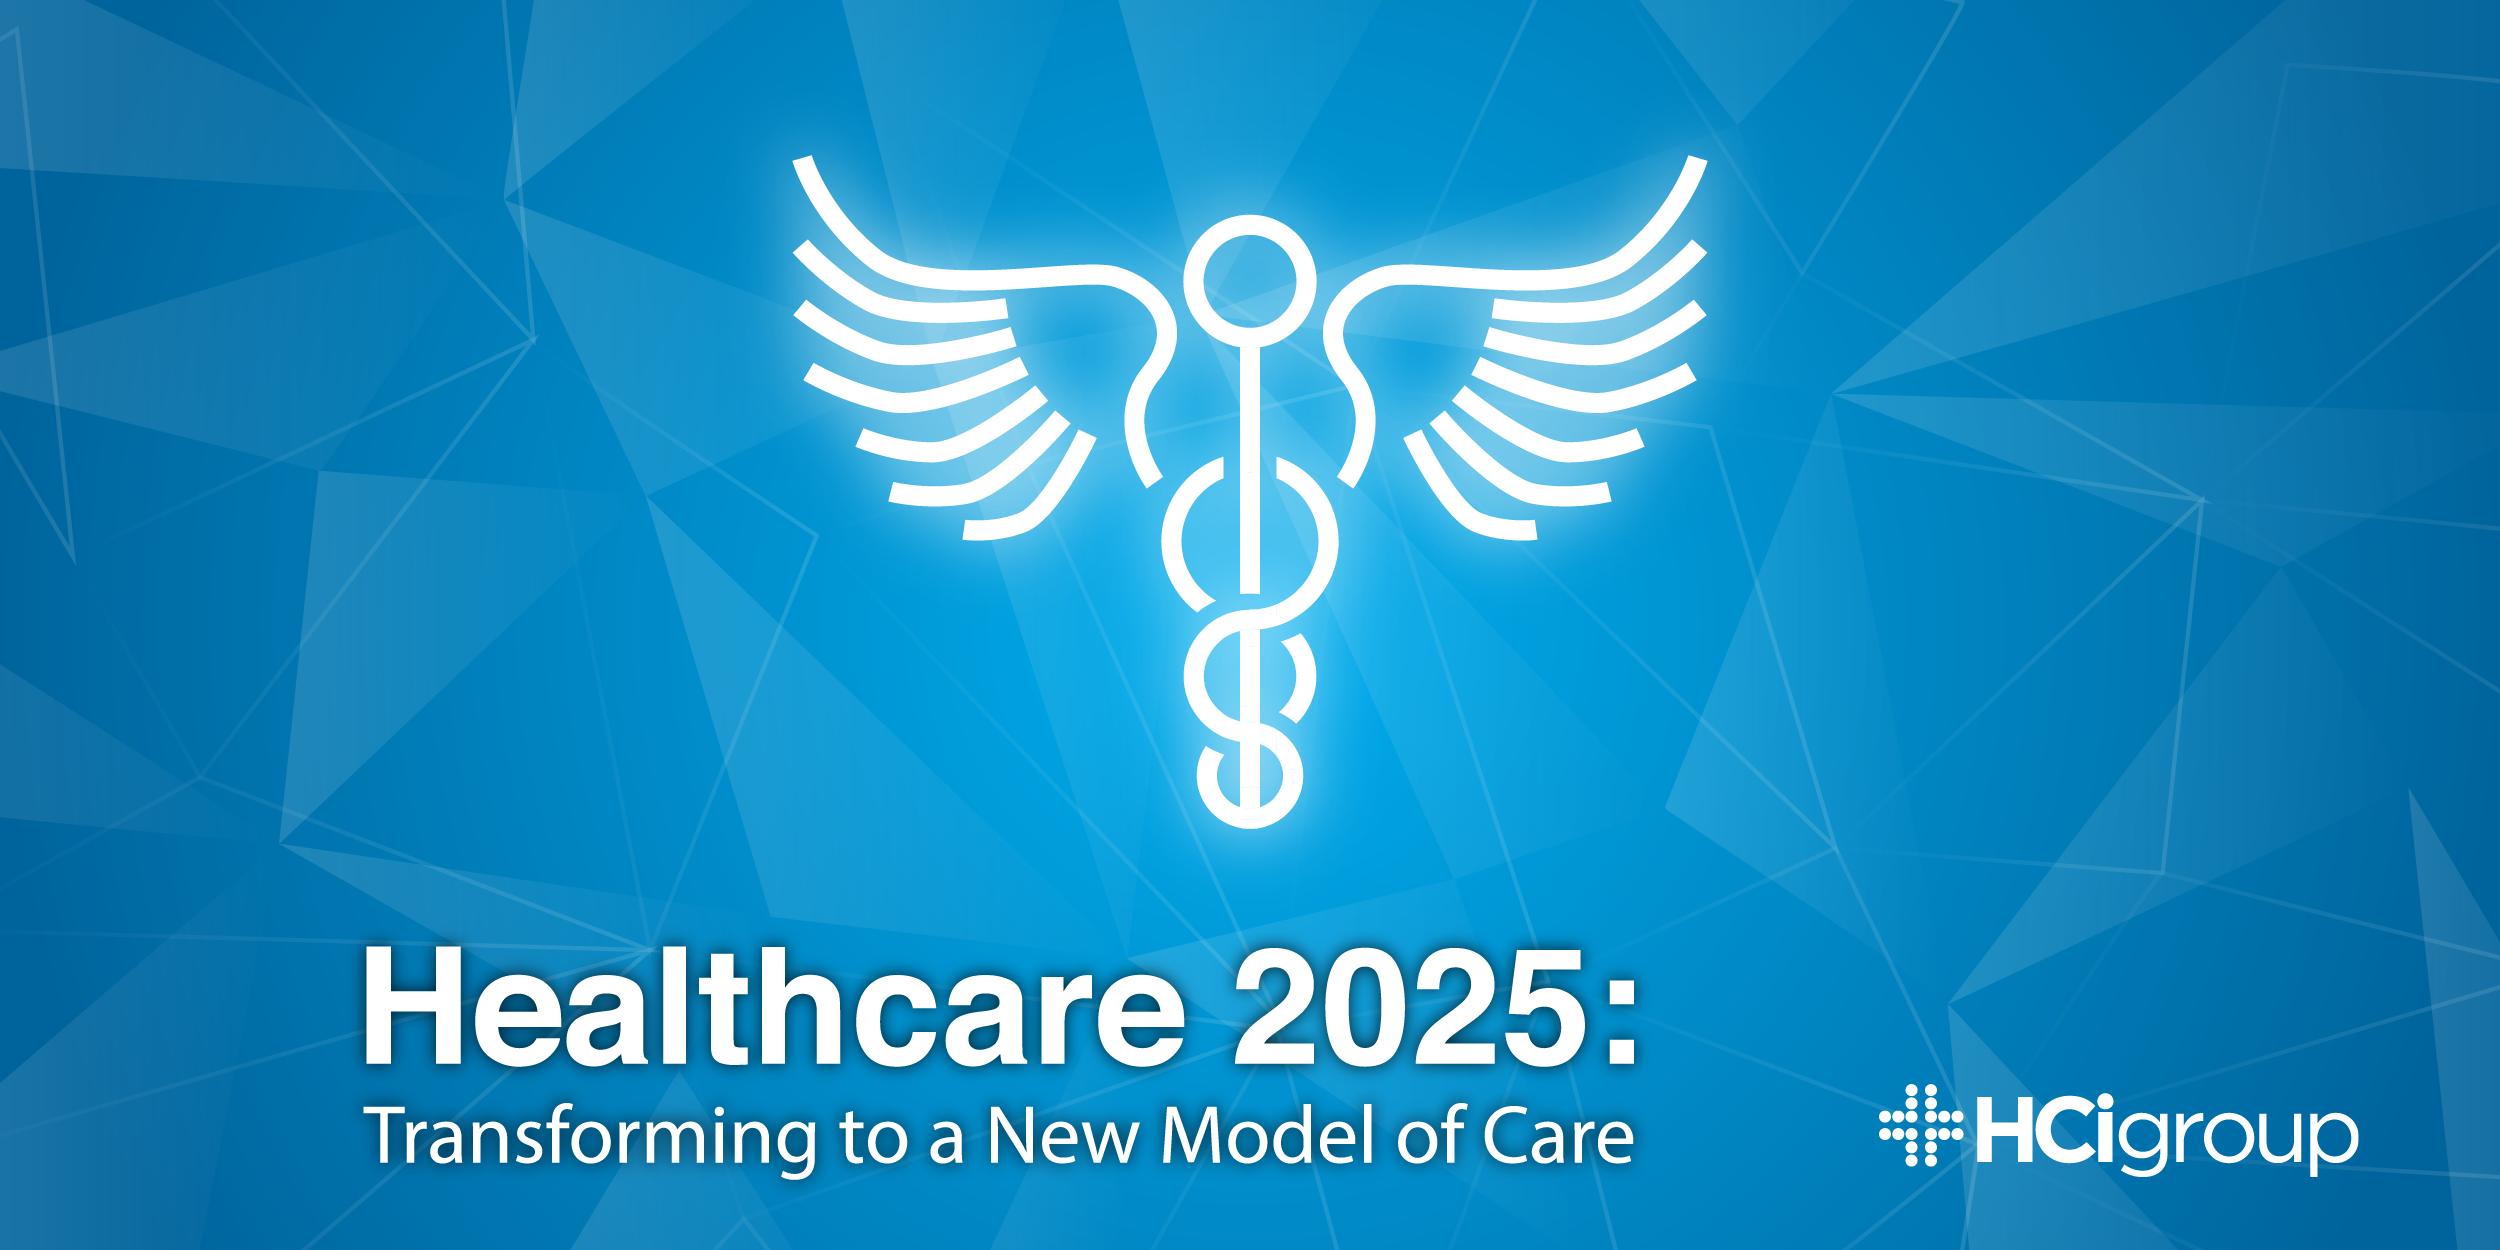 Healthcare 2025